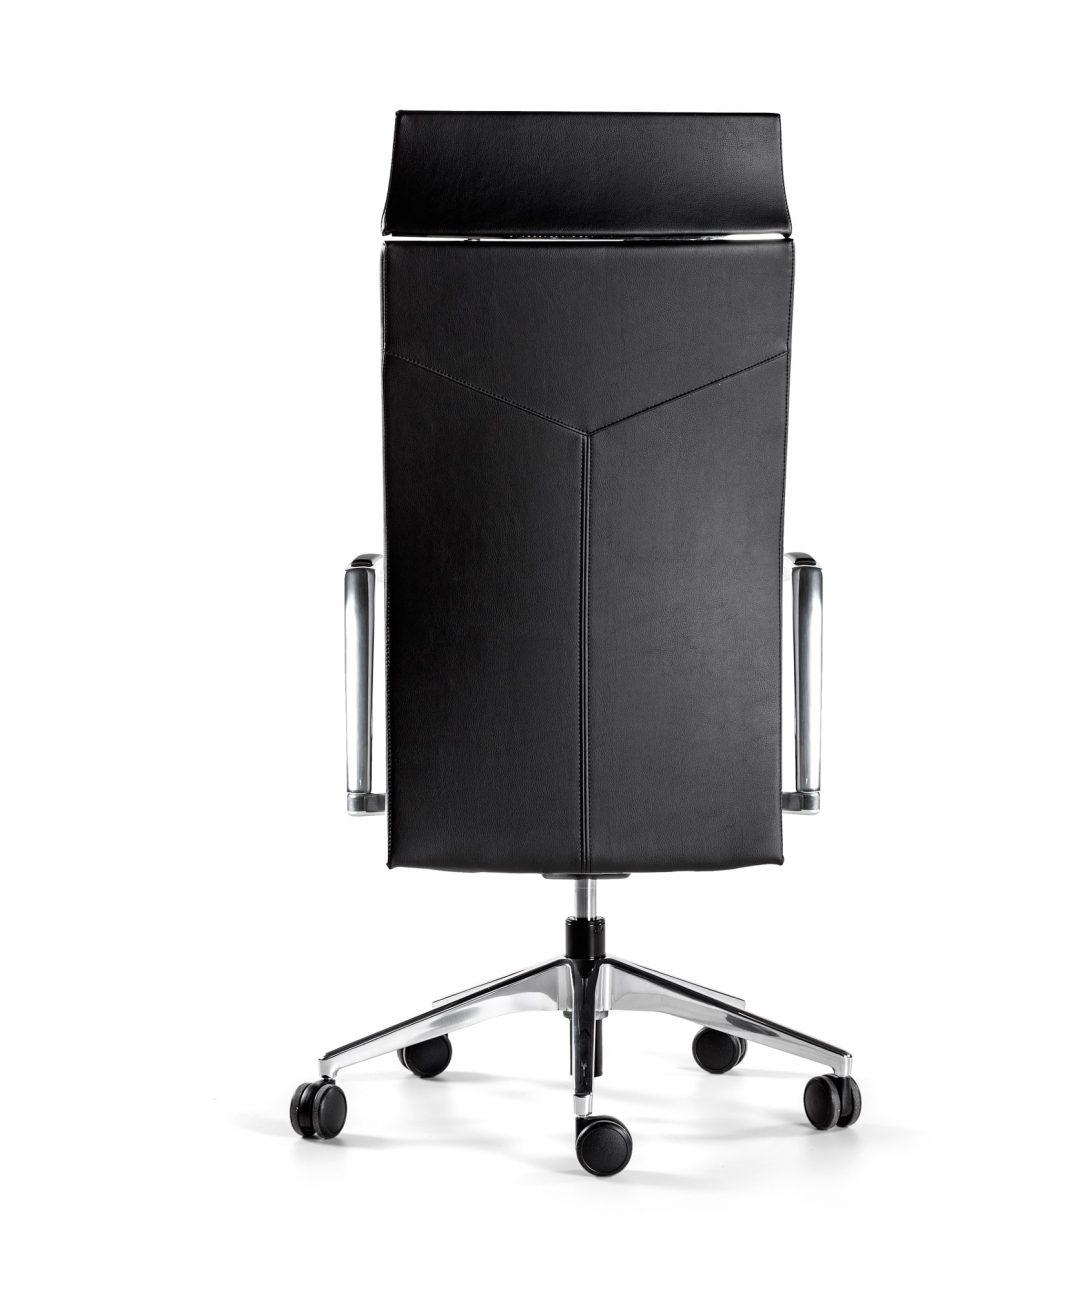 silla negra con respaldo alto brazos y base de aluminio